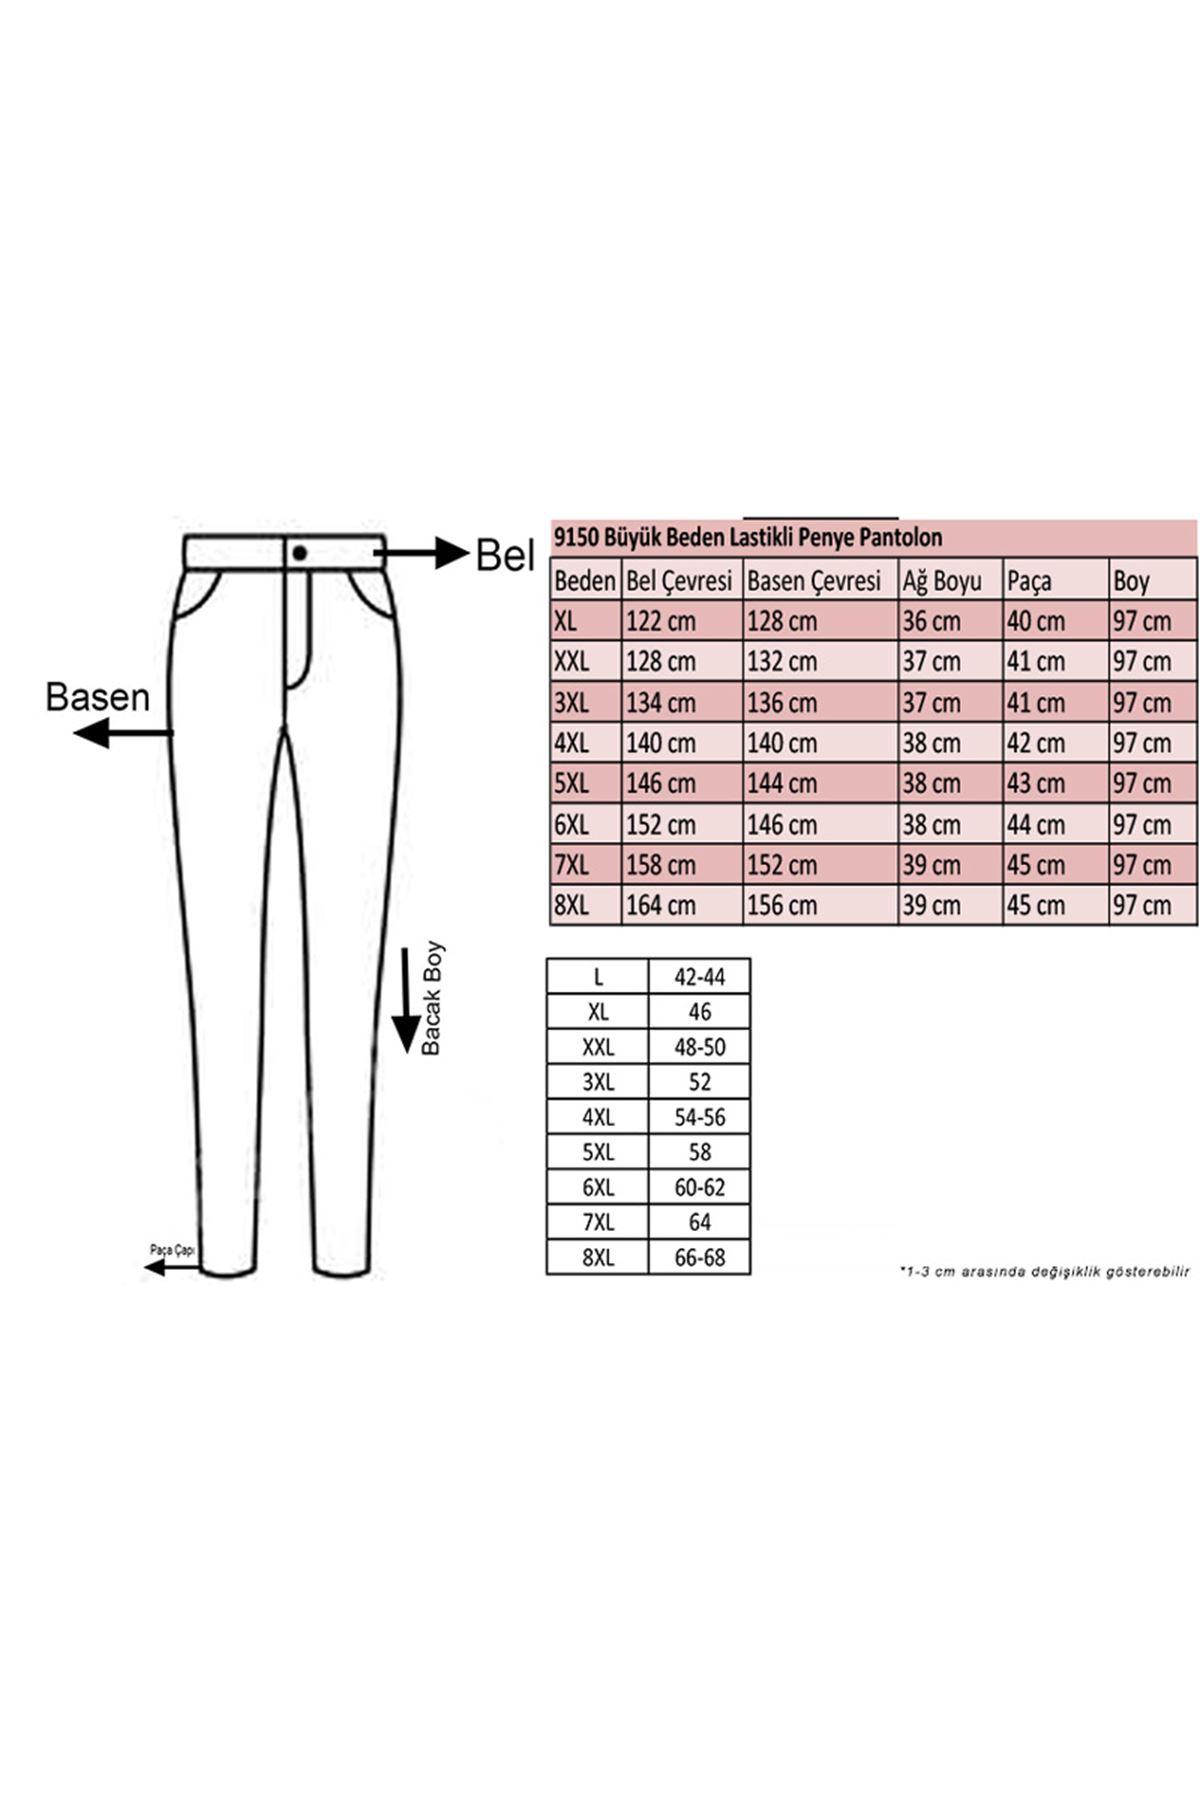 9150 Büyük Beden Lastikli Penye Pantolon - Haki